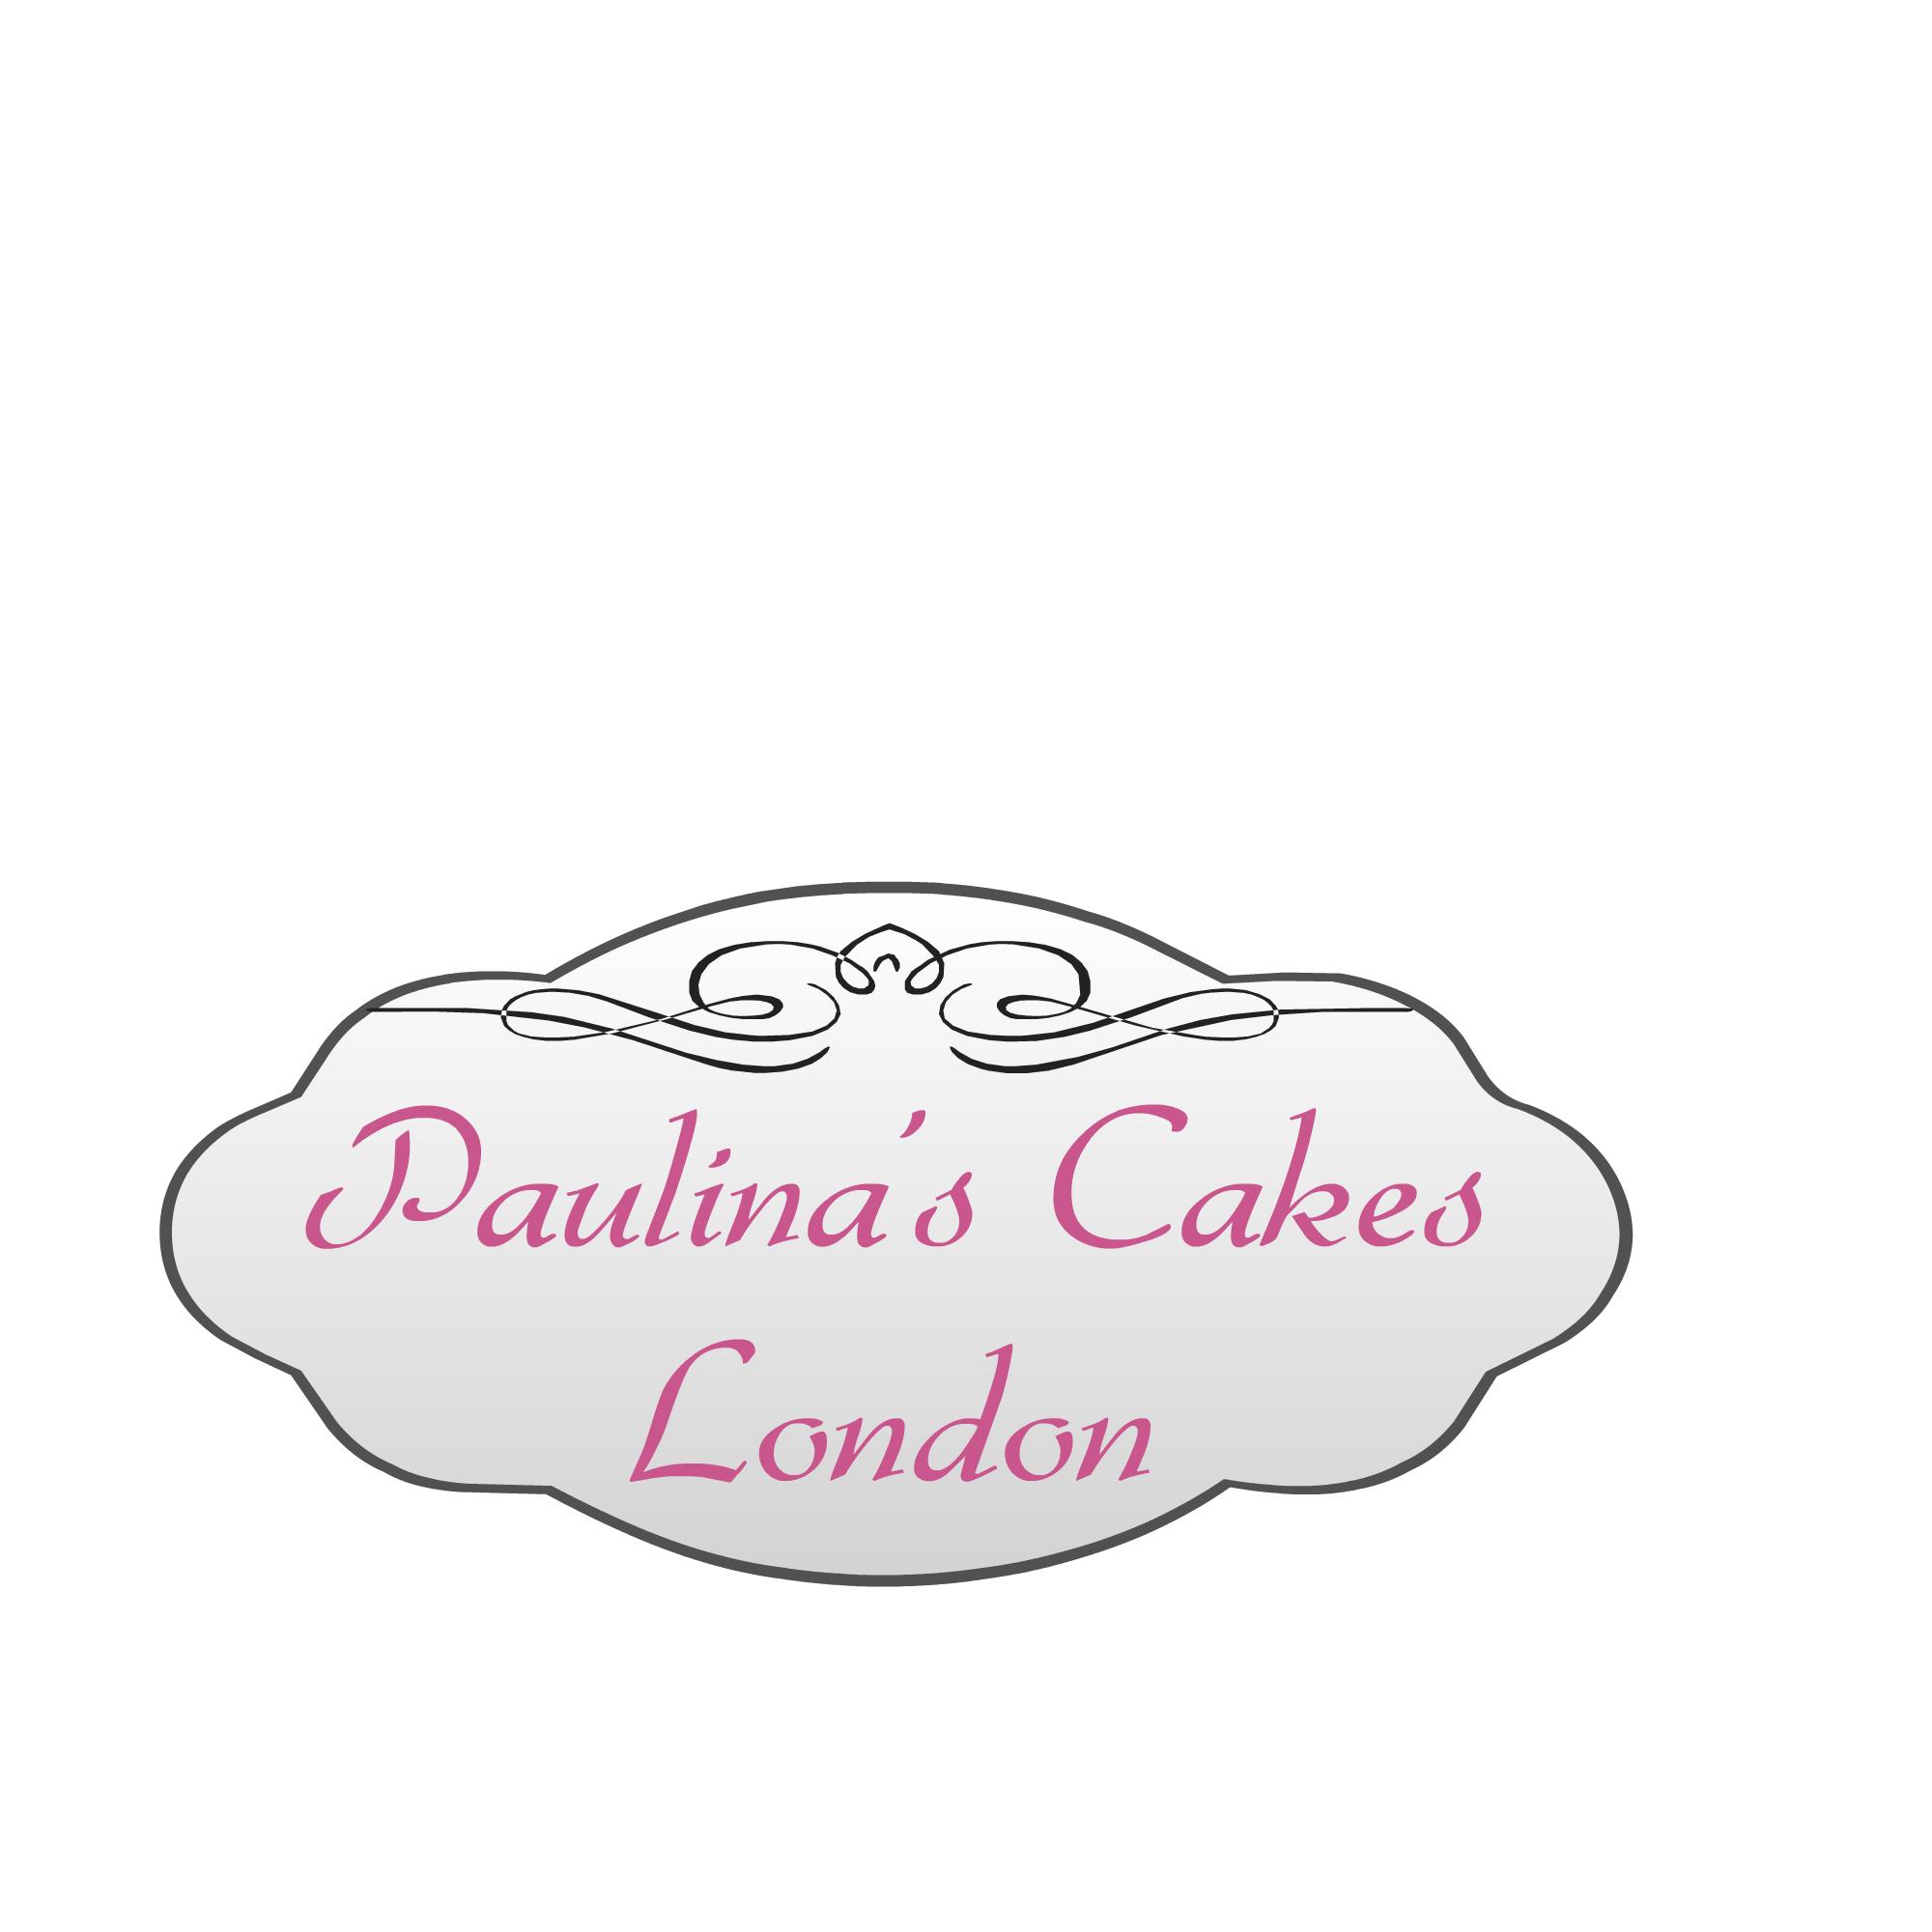 Paulina's cakes